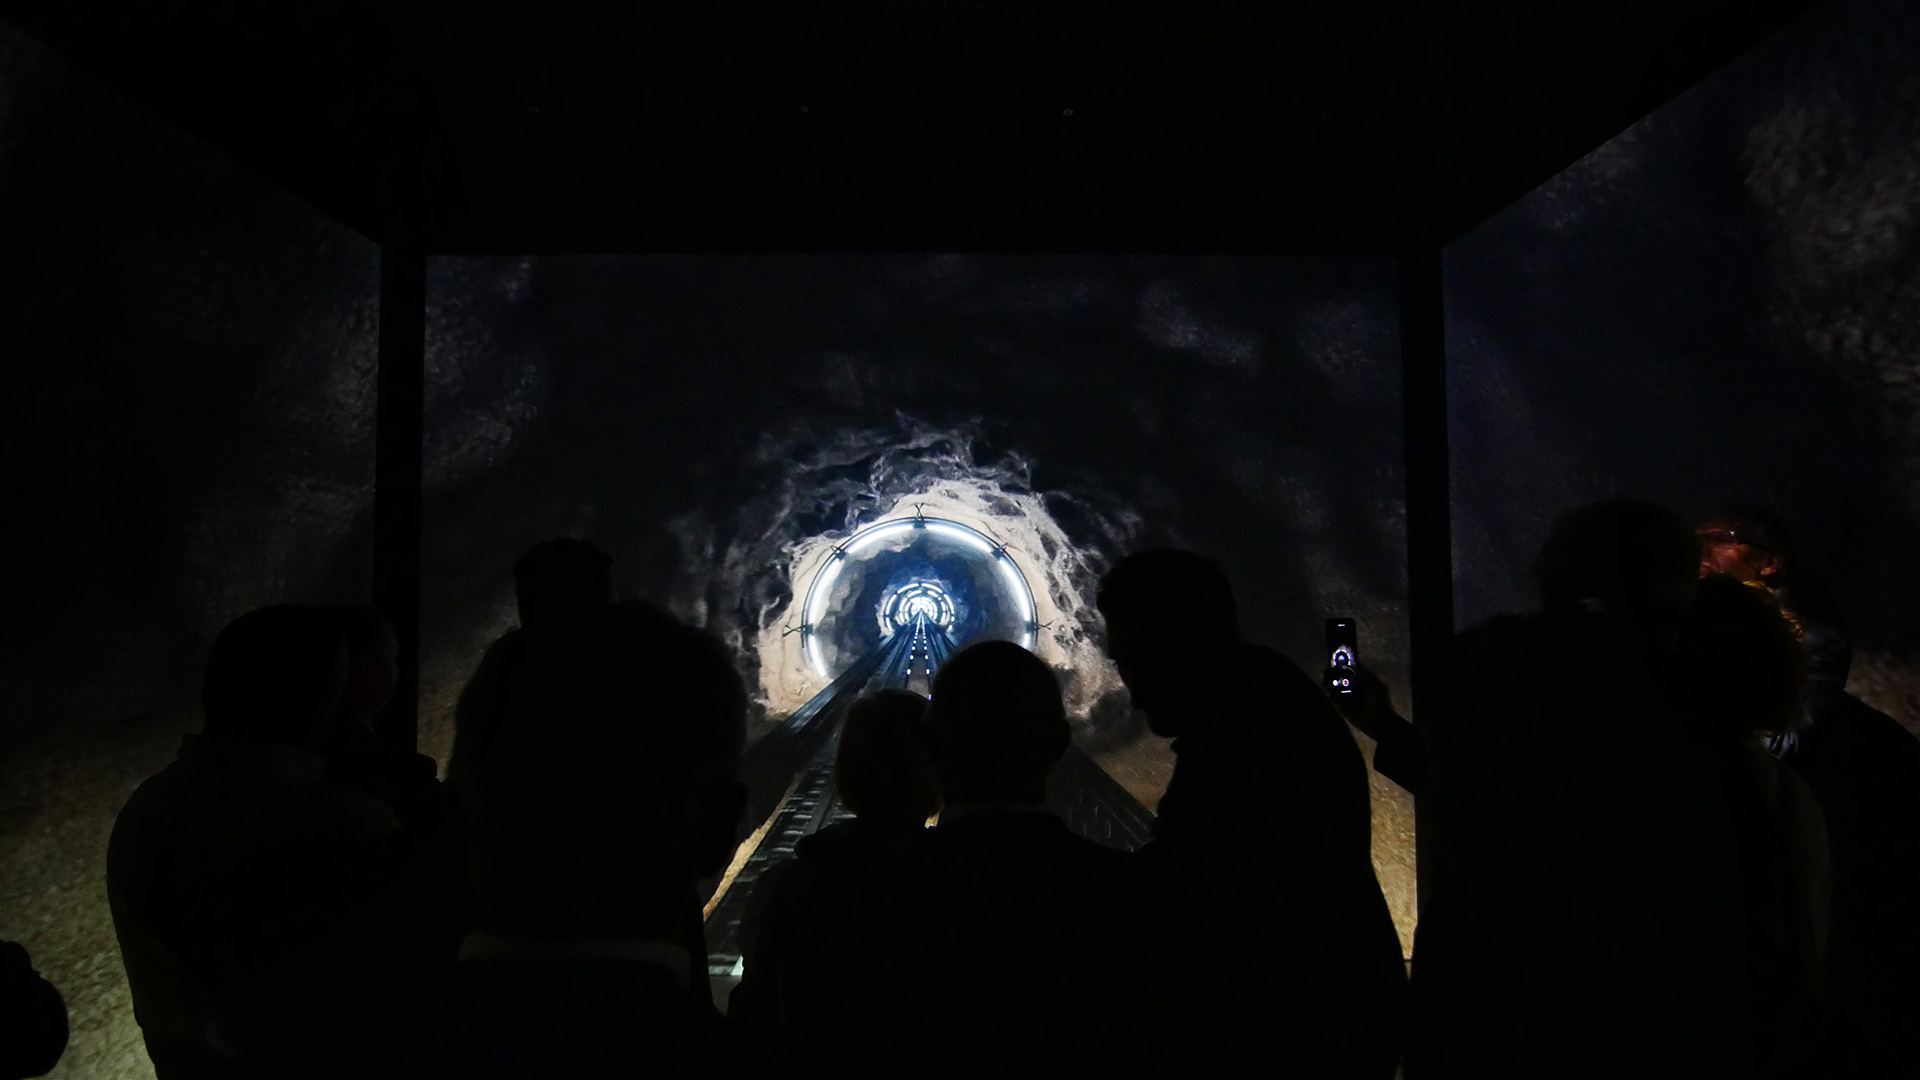 MelindaGoldenTheatre- Esperienza Immersiva - Tunnel